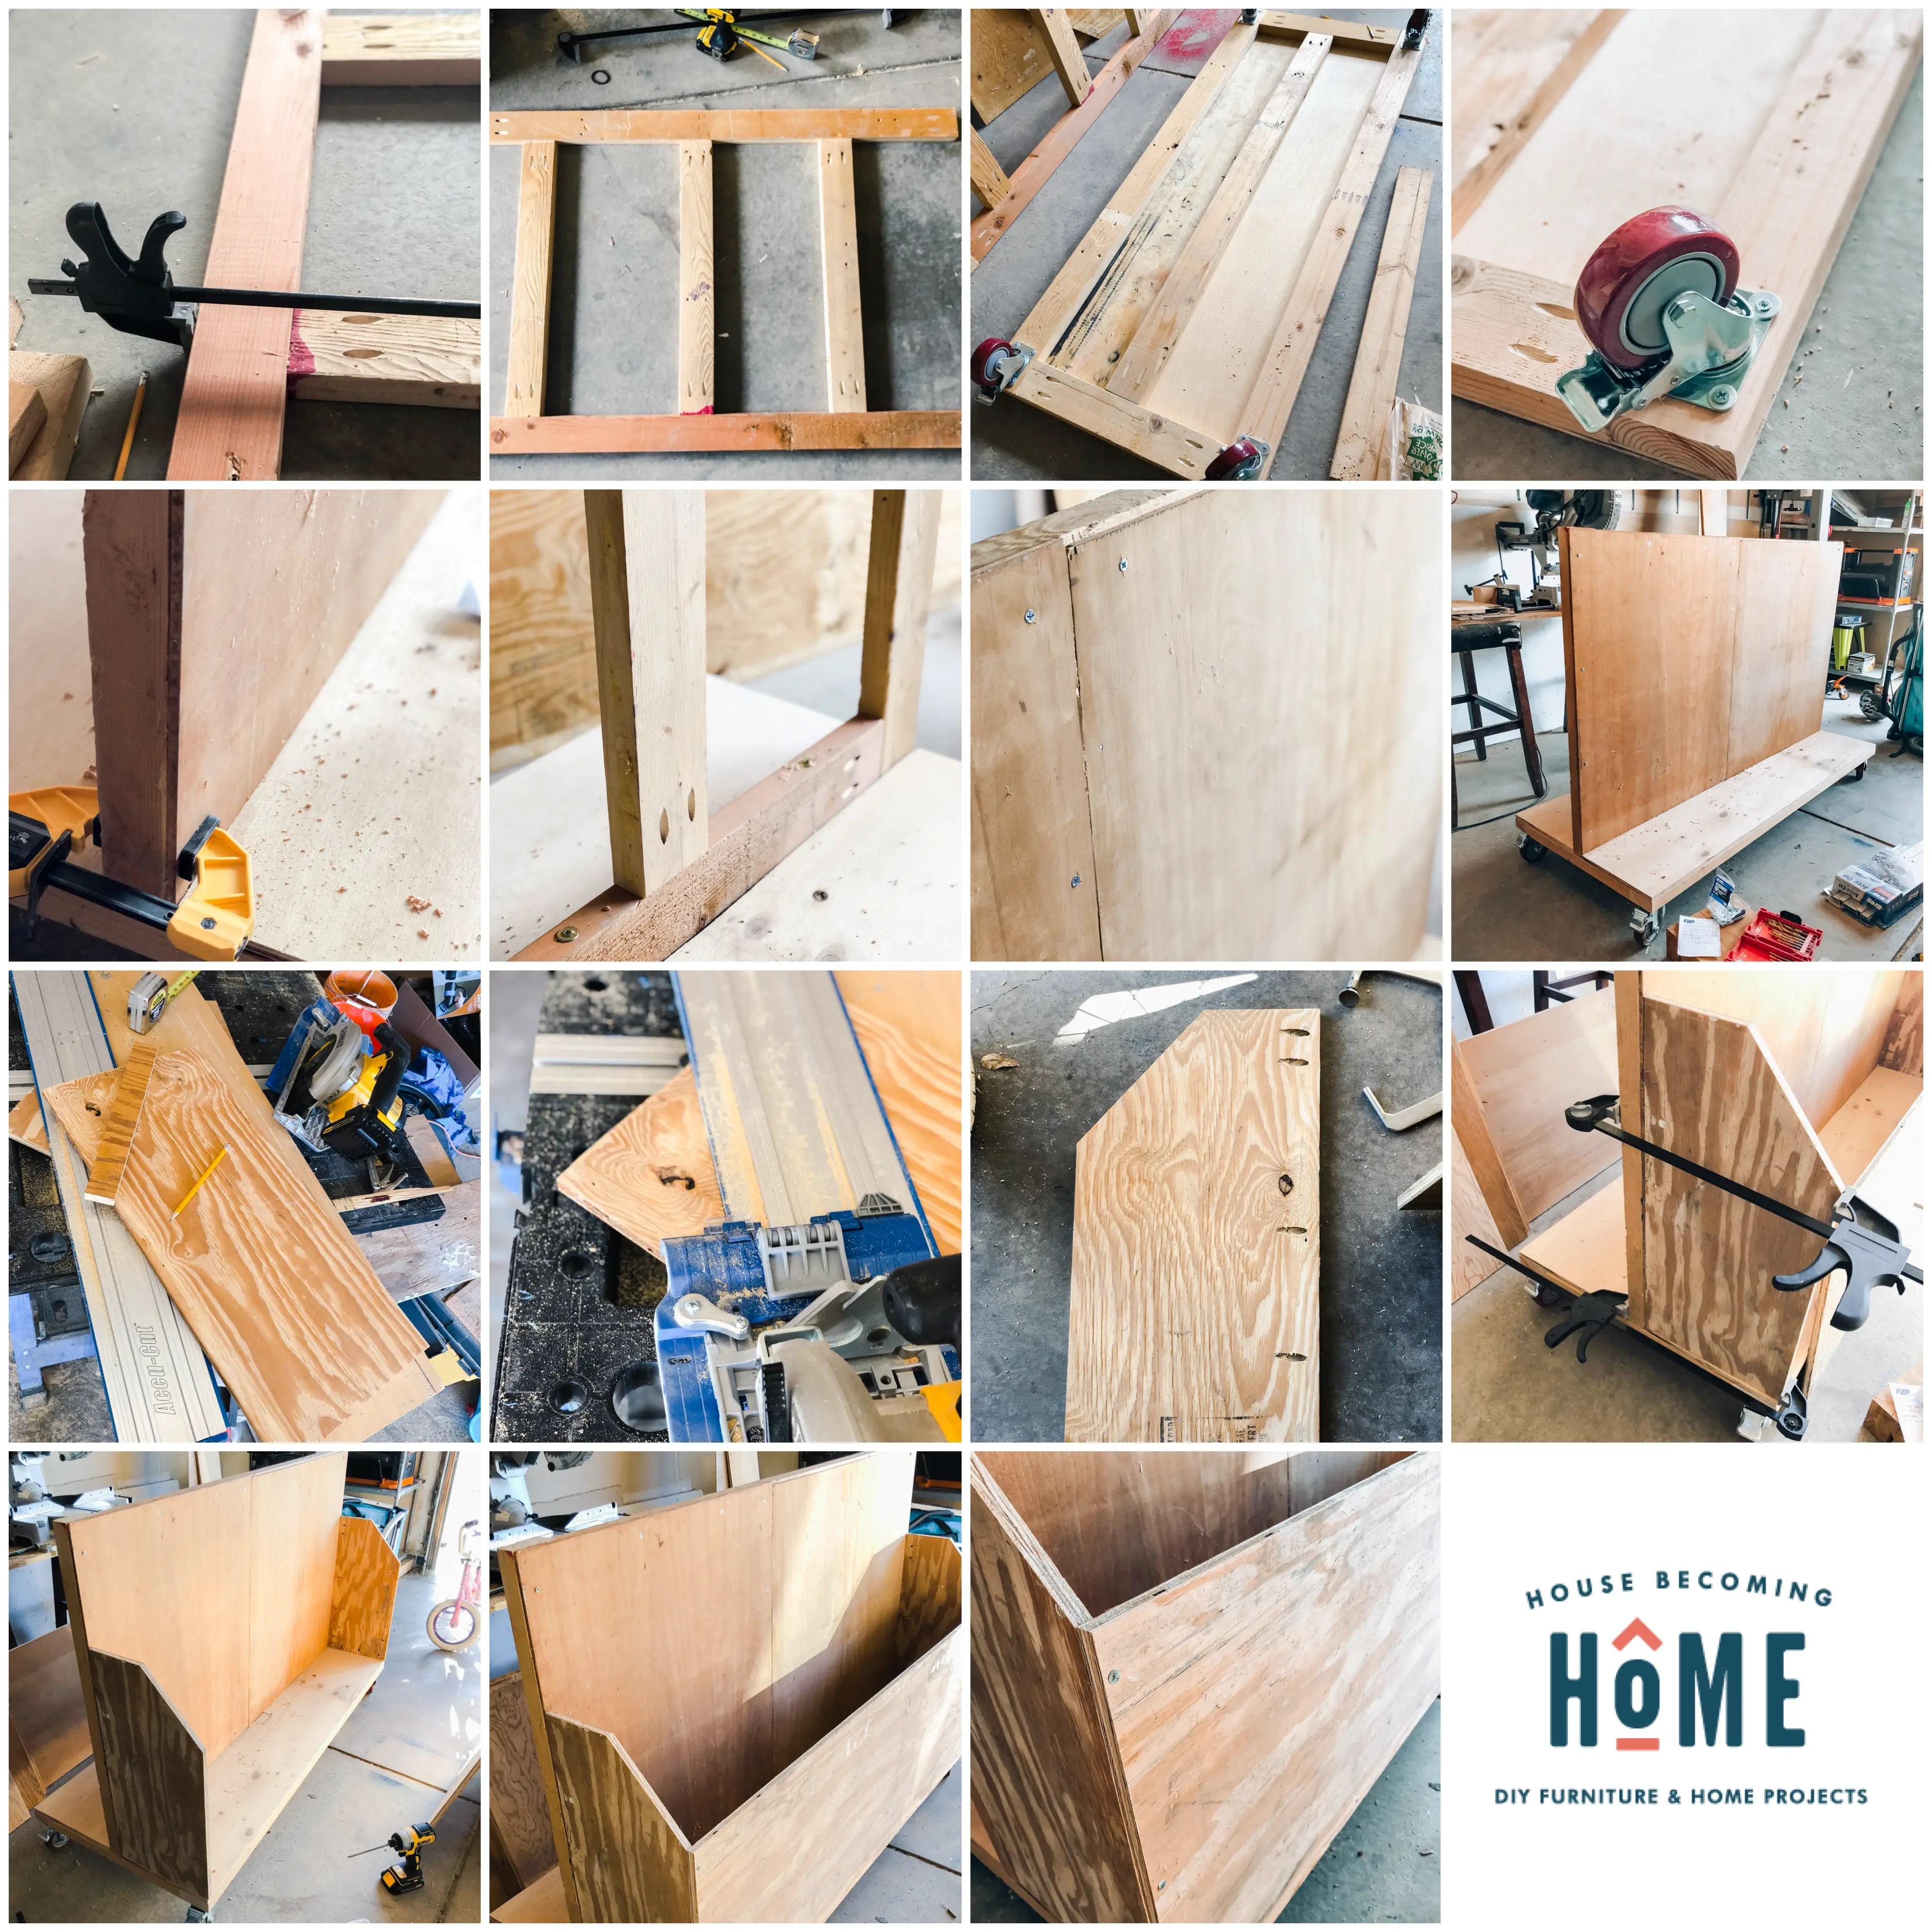 Process of Building a DIY Scrap Wood Organizer Cart